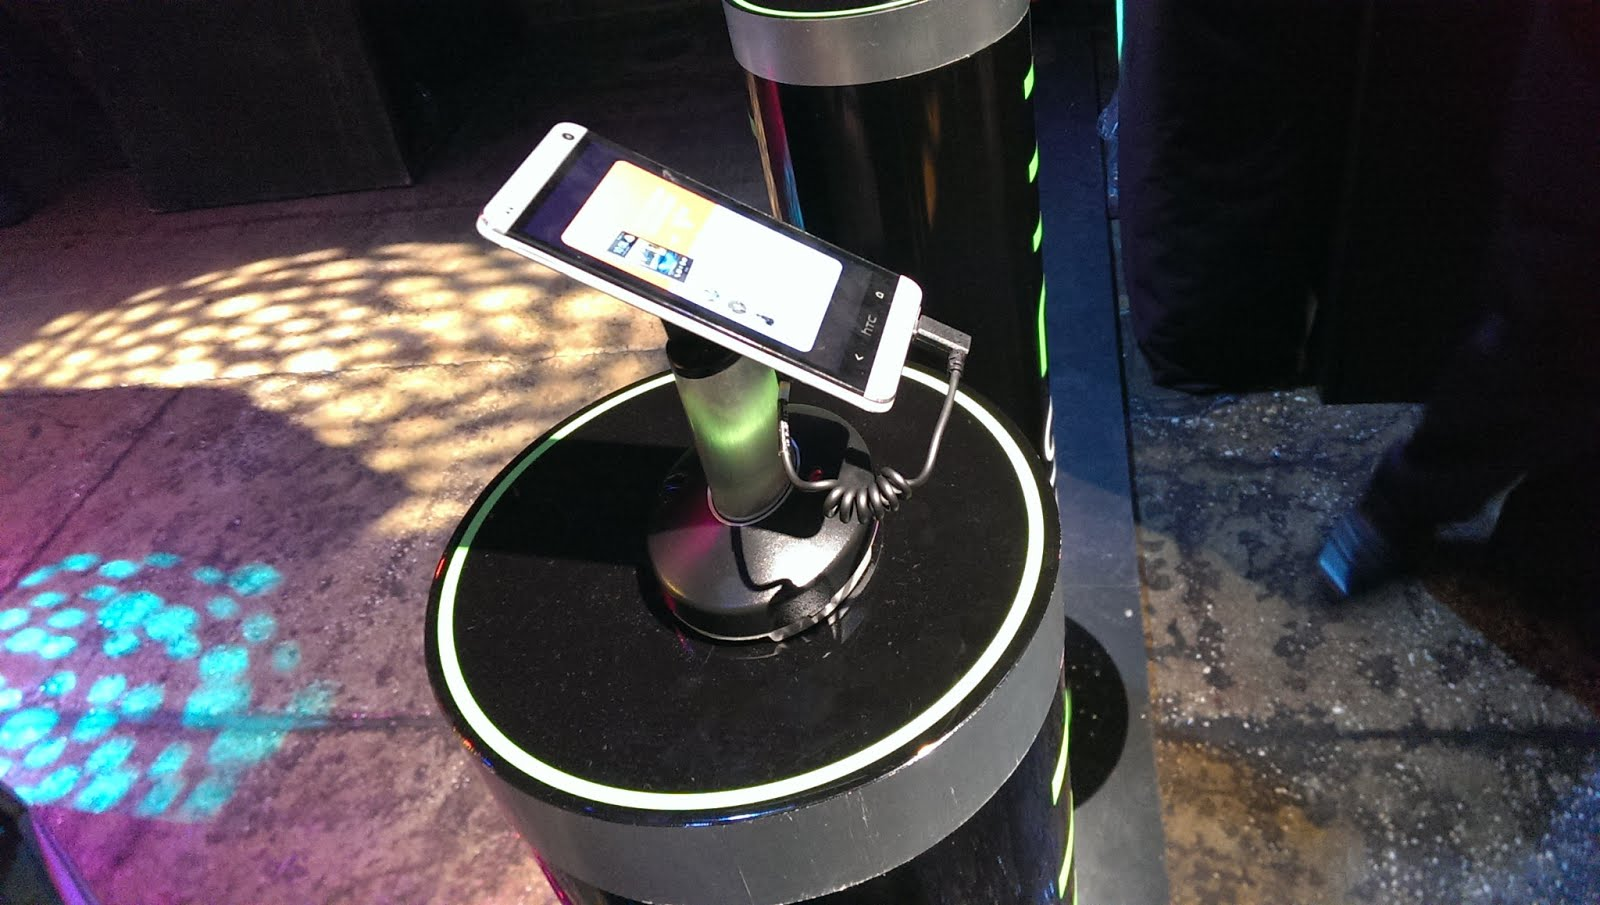 Primele fotografii realizate cu camera lui HTC One și un clip video demonstrativ (Video)